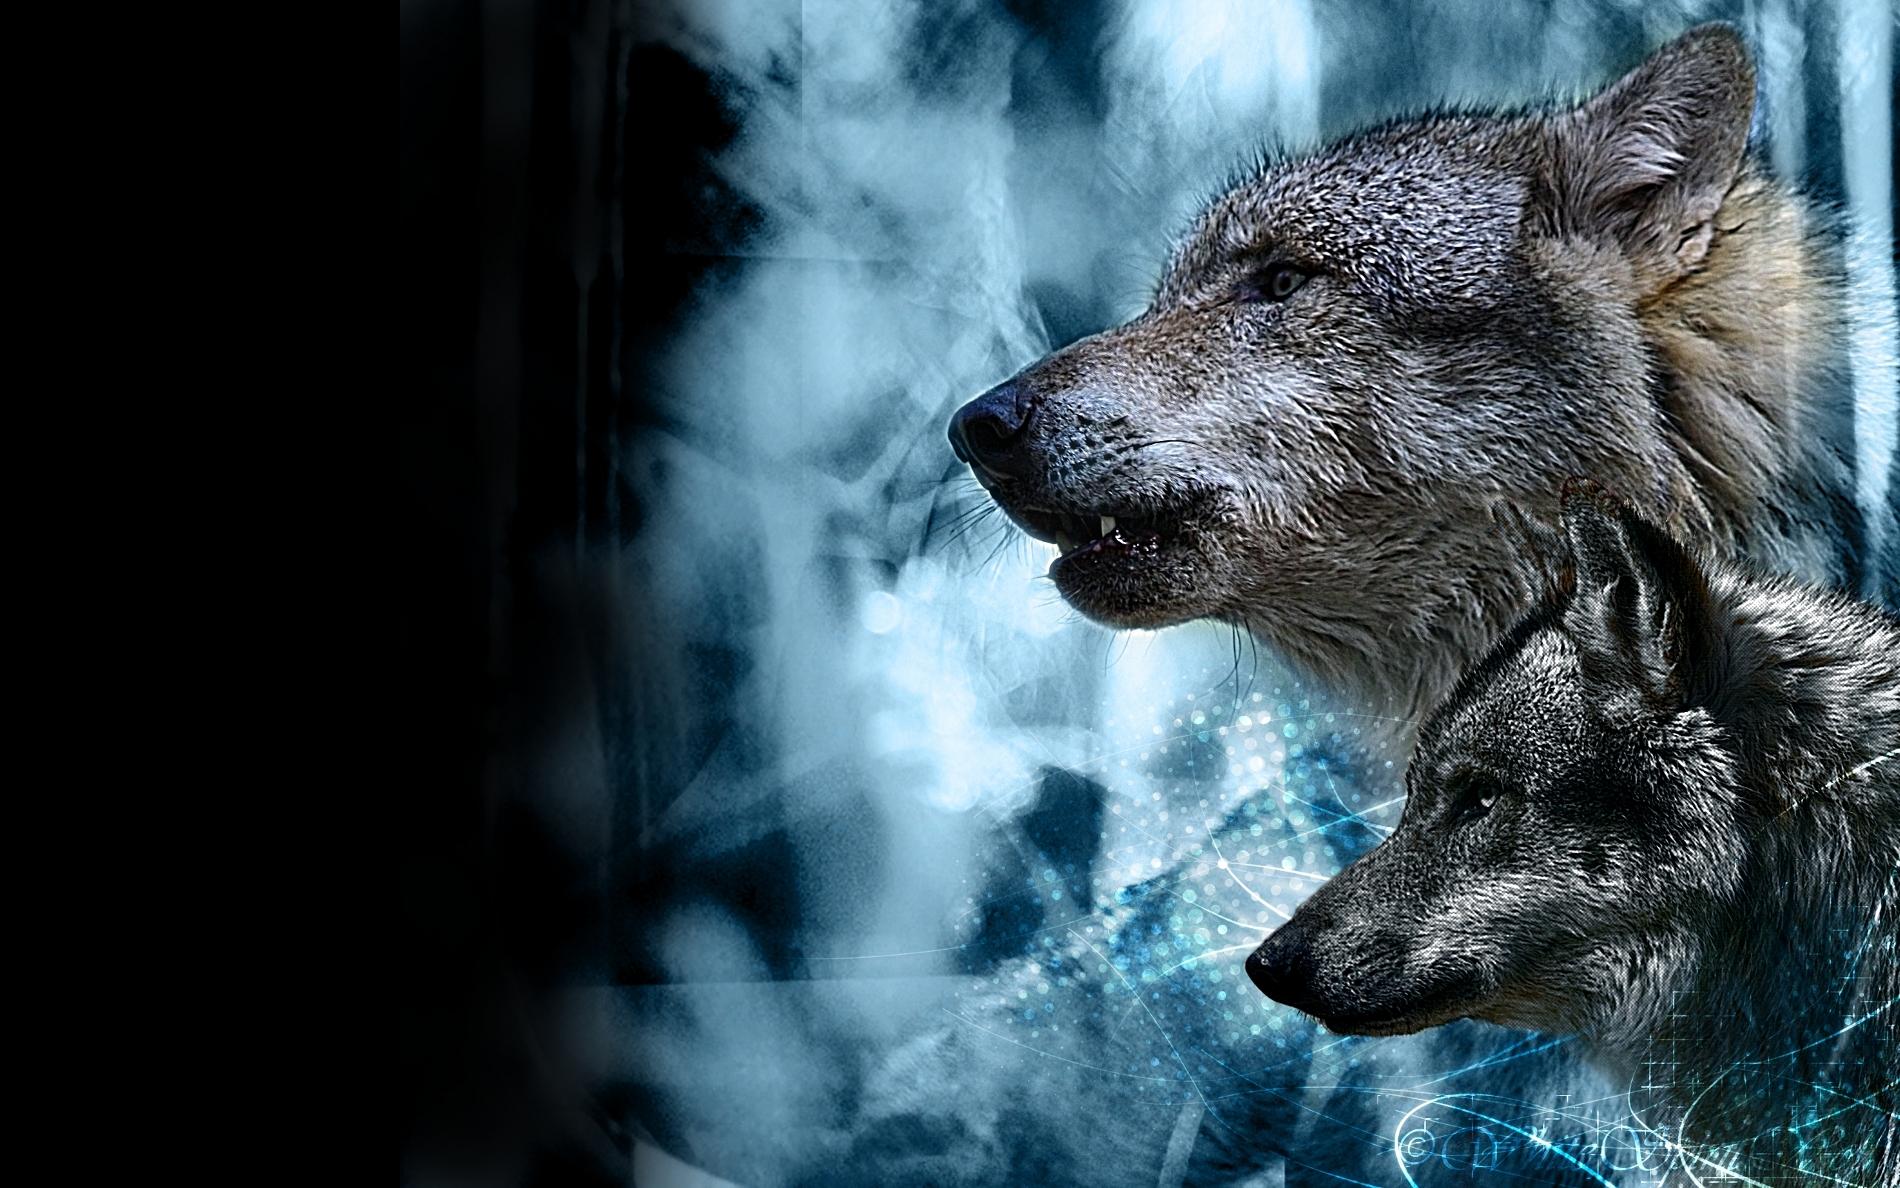 Fondos para escritorio de lobos fondos de pantalla for Imagenes para fondo de escritorio 3d